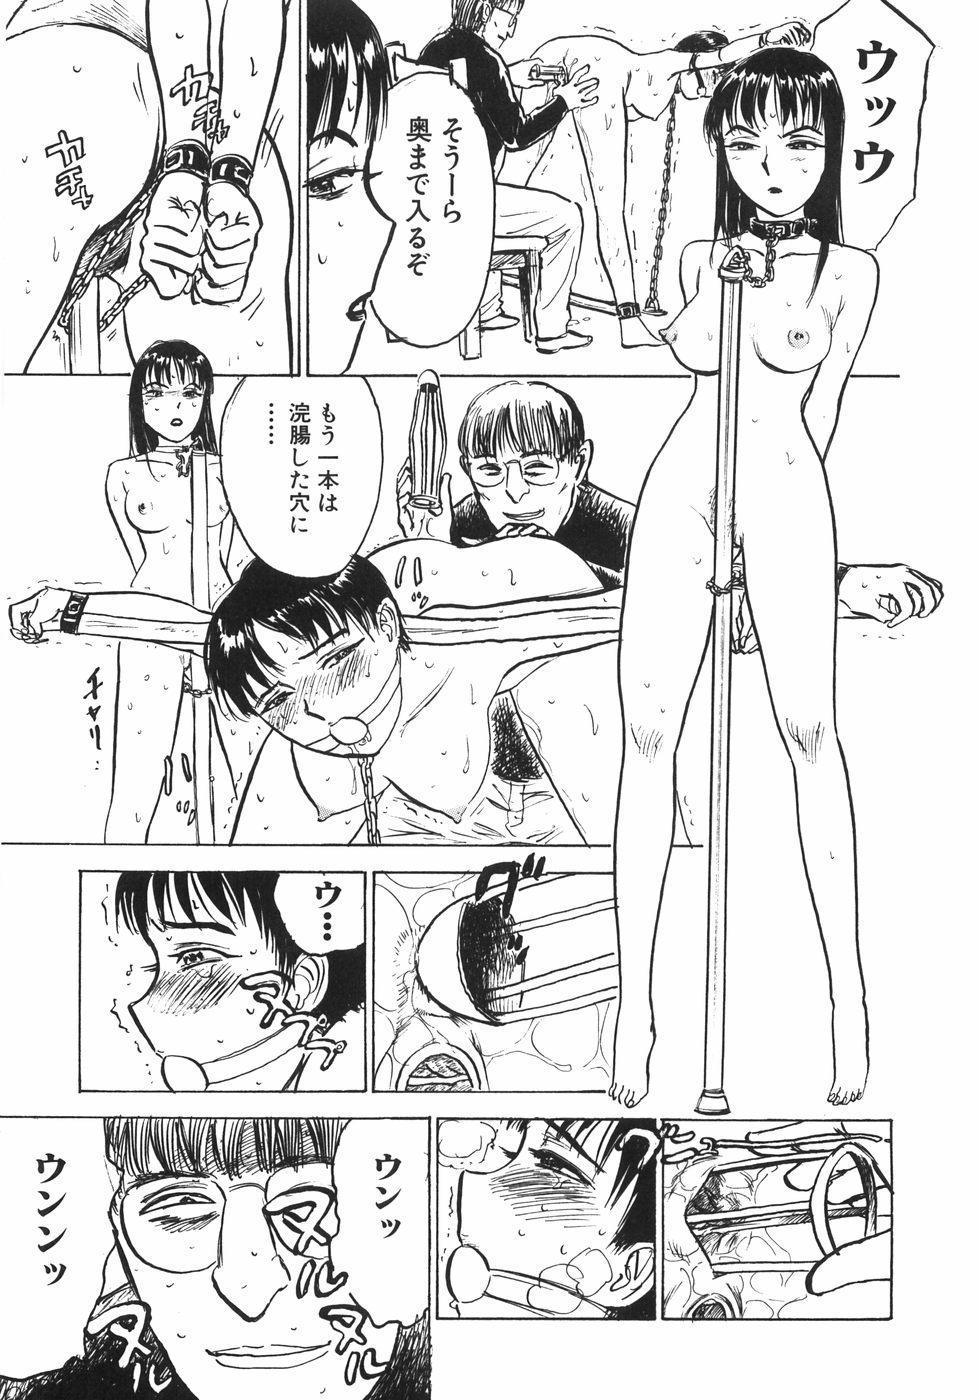 Ningyou no Yakata - The Doll House 143